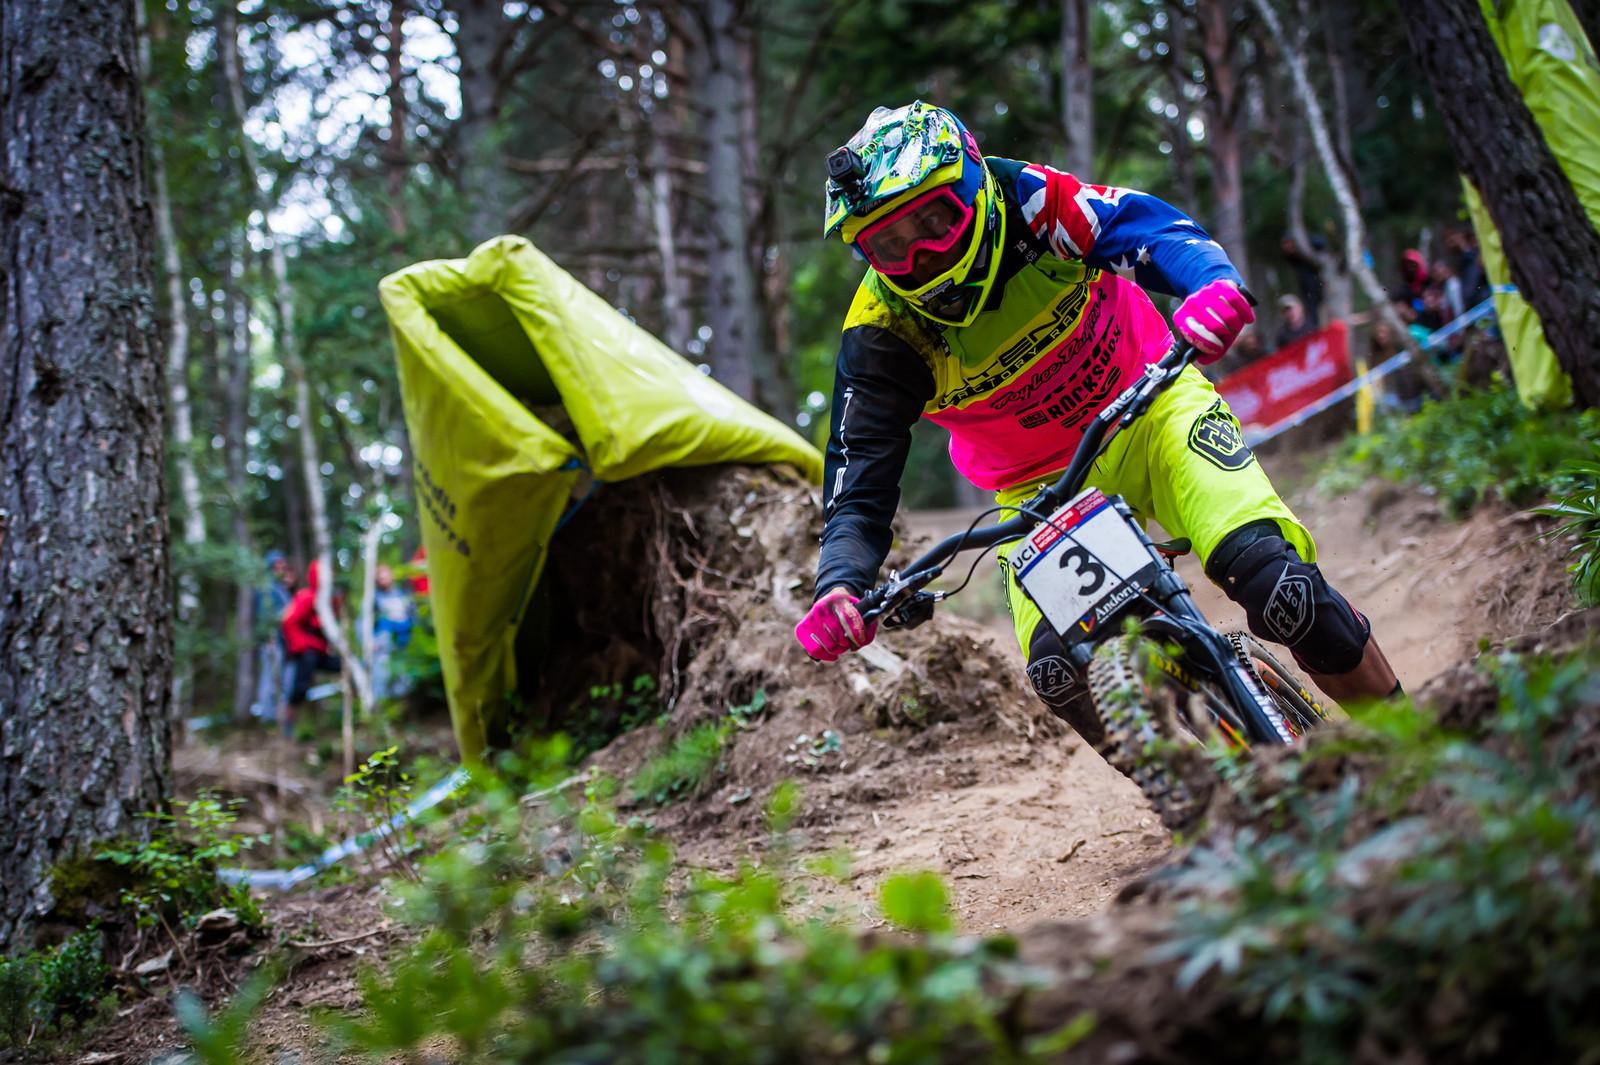 Jack Moir Finals - iceman2058 - Mountain Biking Pictures - Vital MTB